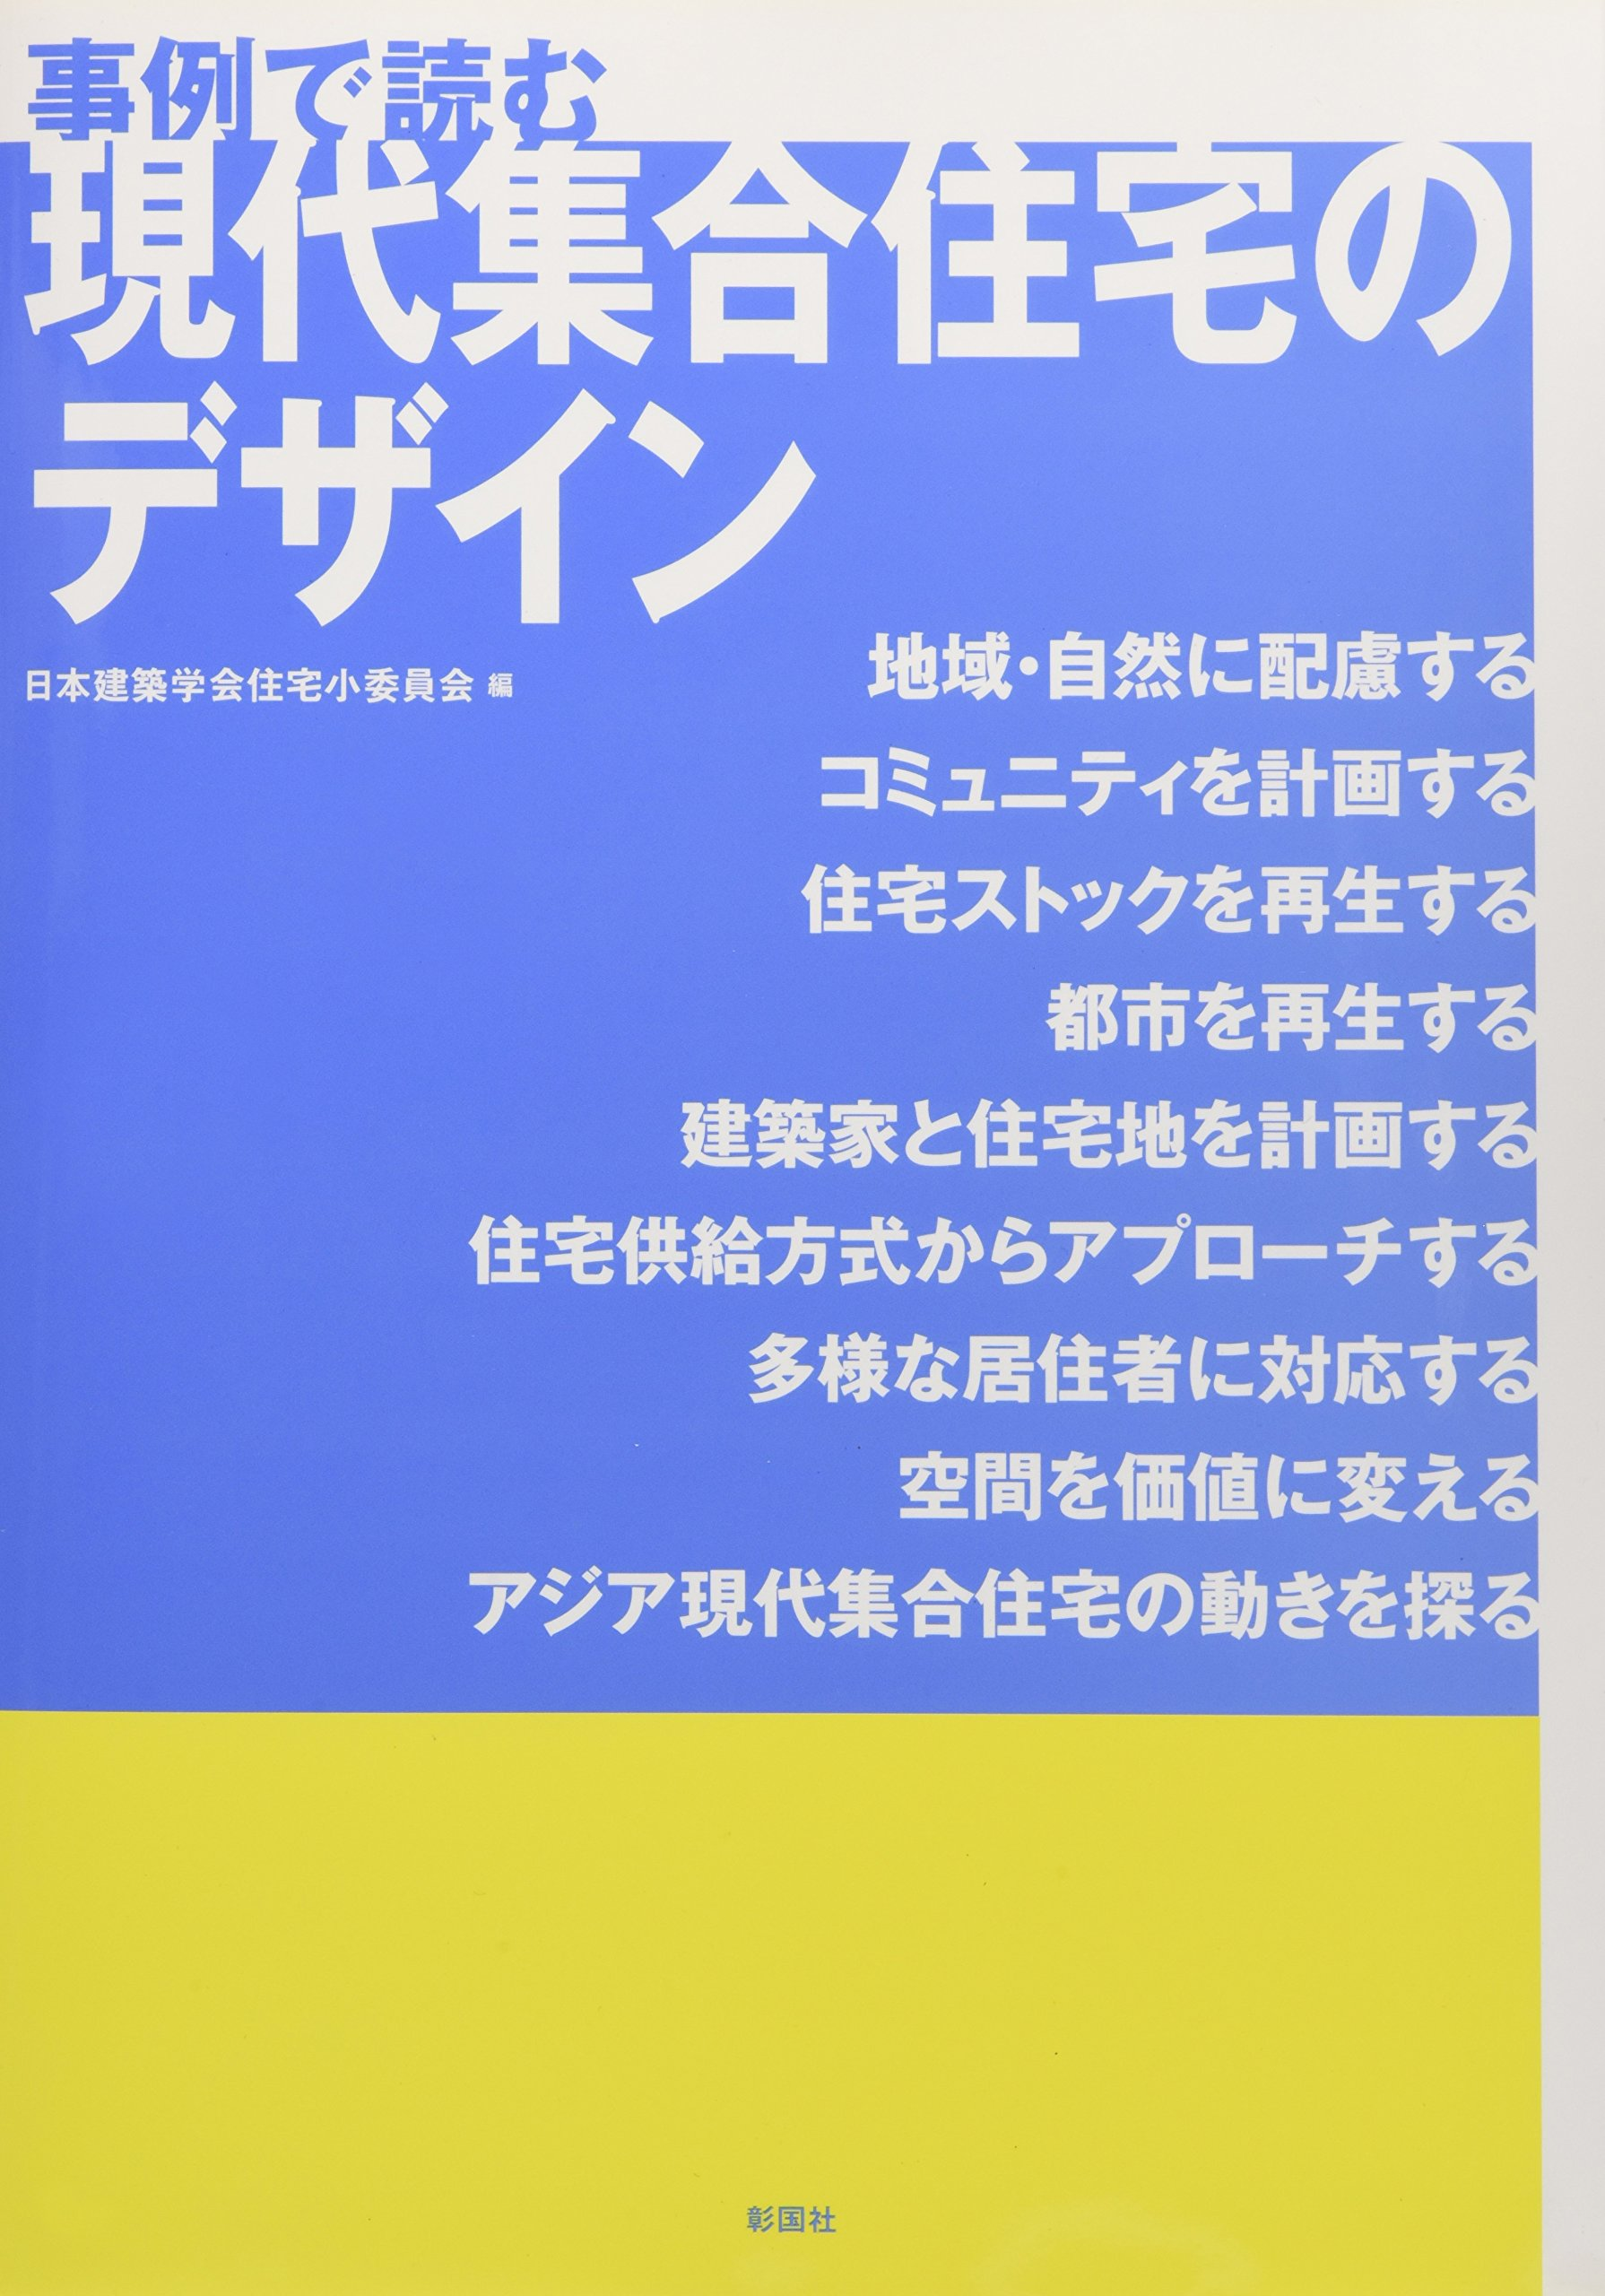 Download Jirei de yomu gendai shūgō jūtaku no dezain. PDF